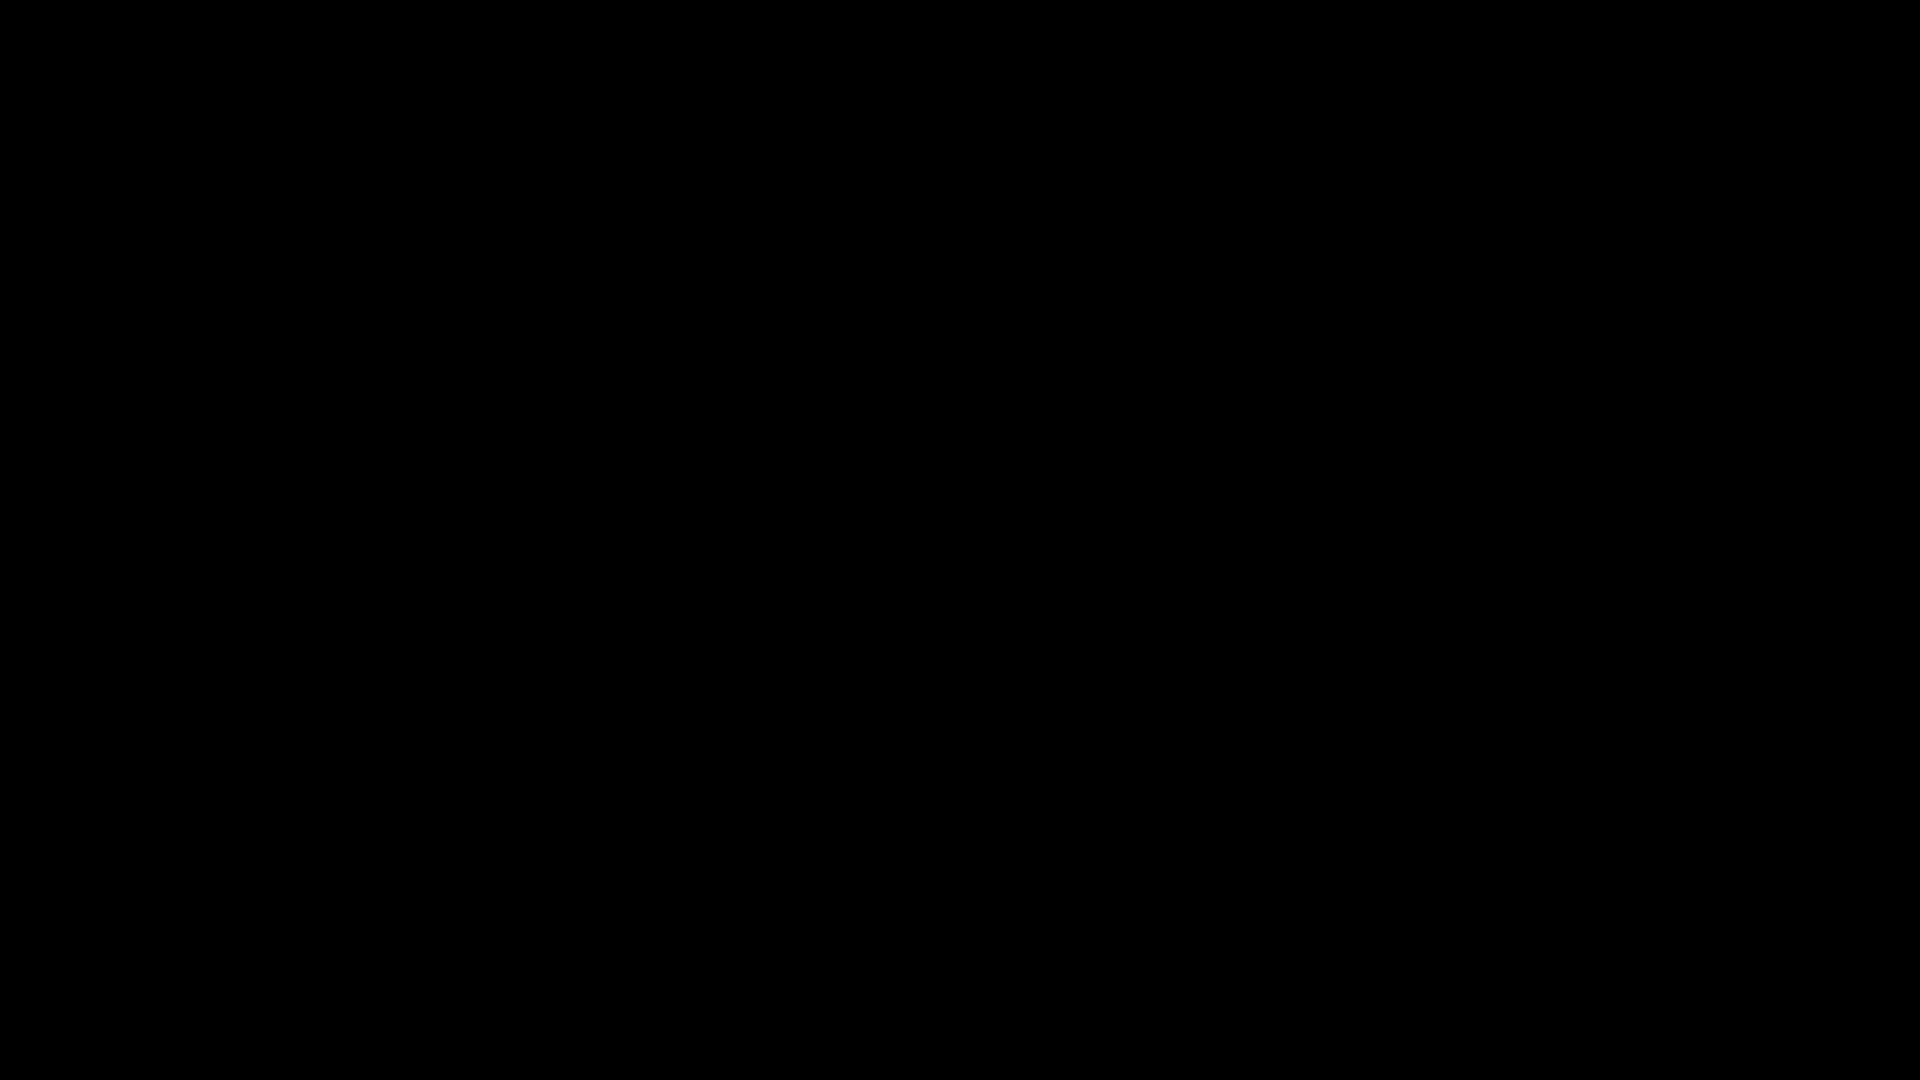 Black Texture HD Backgrounds 1062 – HD Wallpaper Site